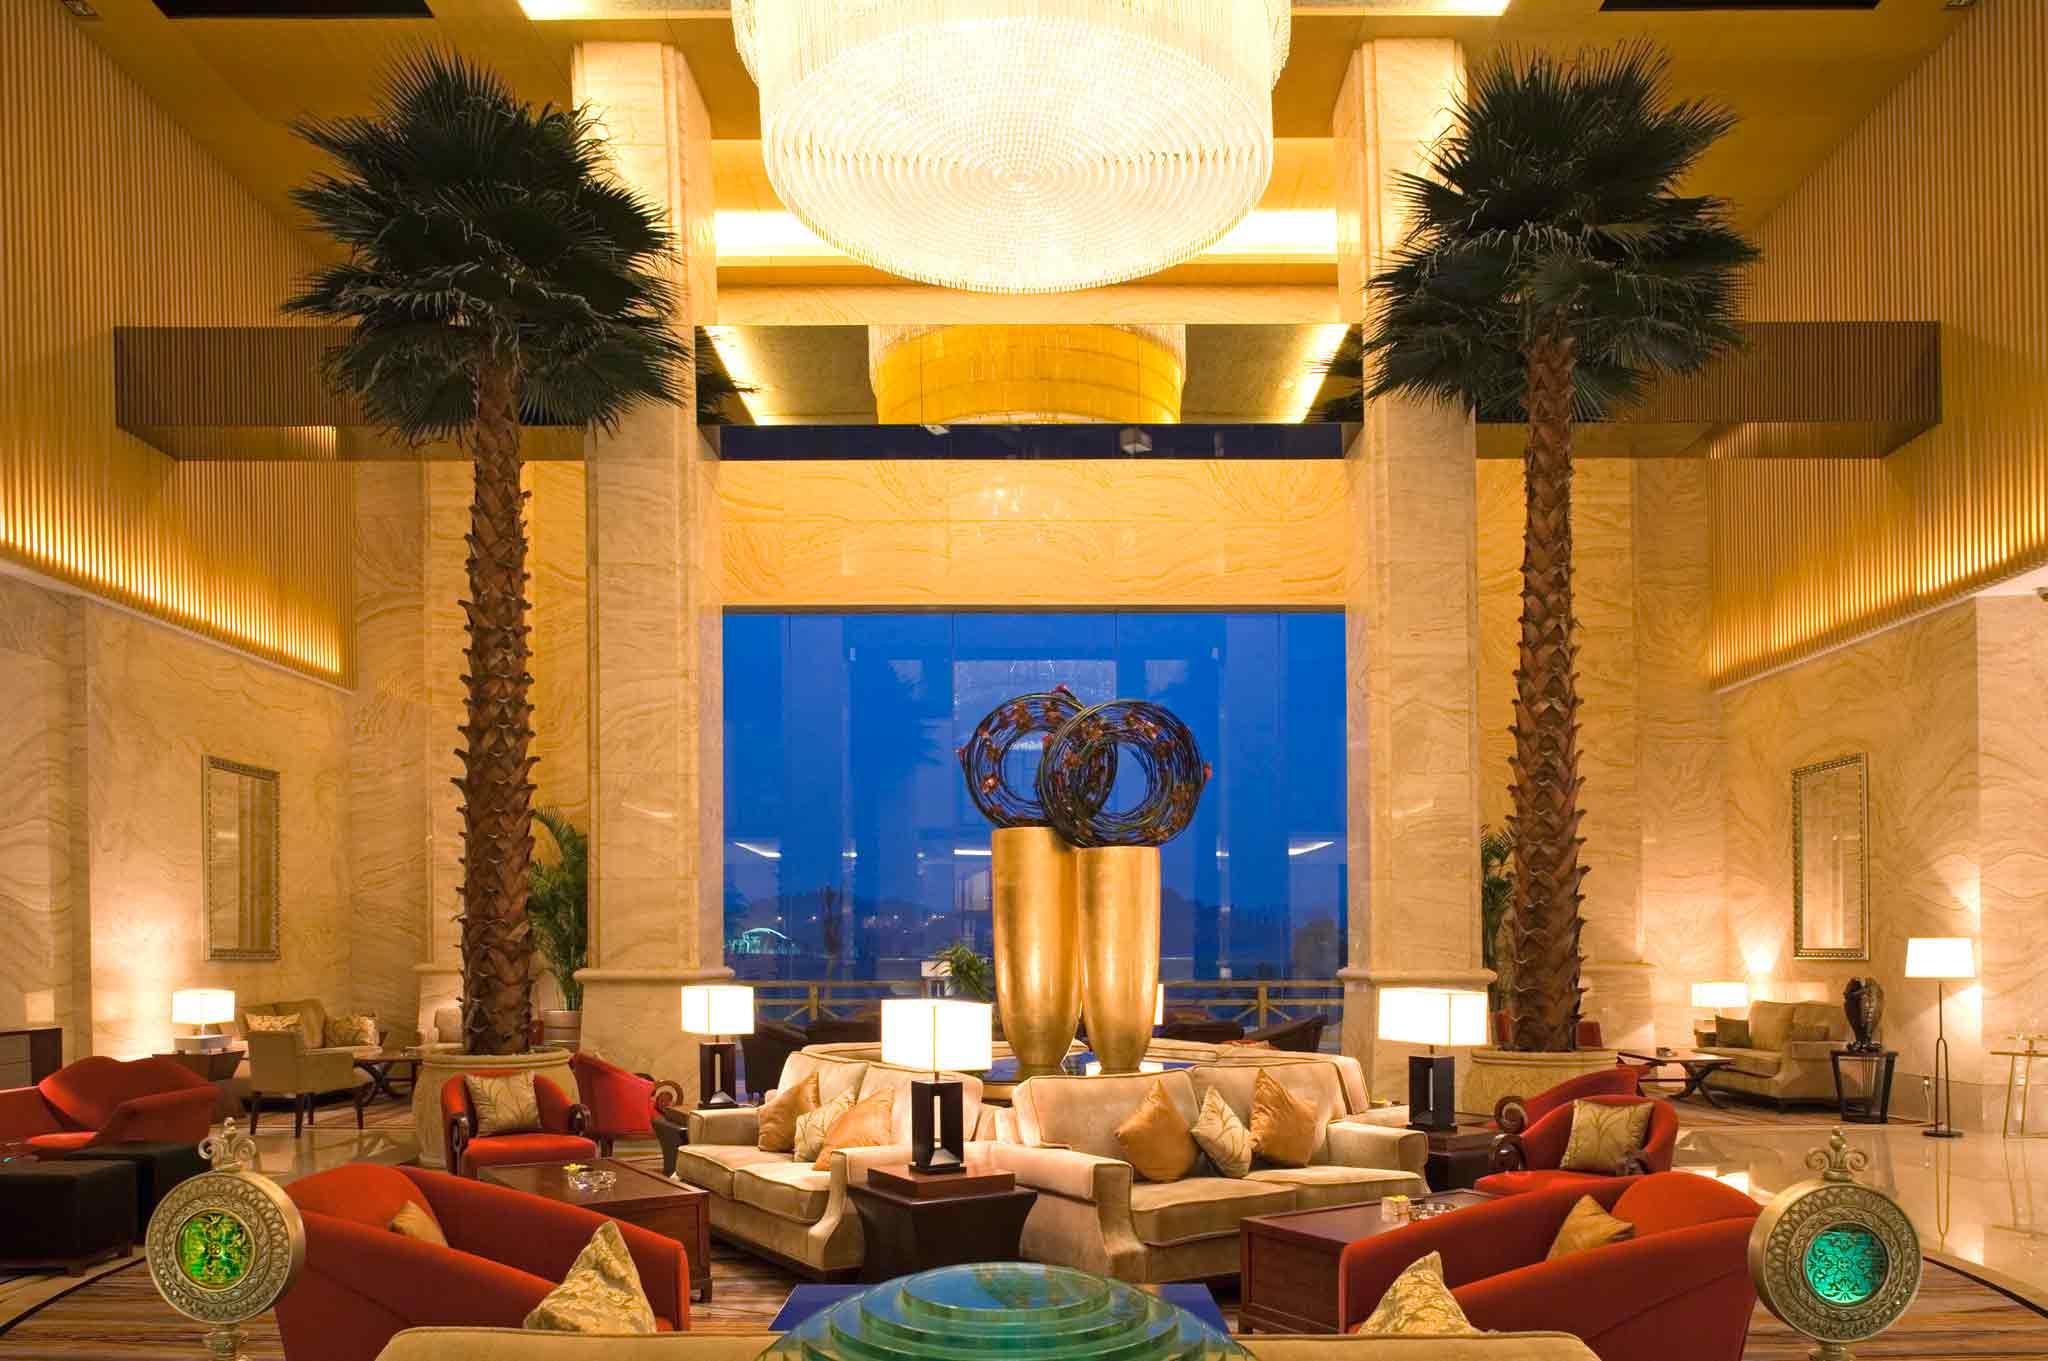 Hotel - Sofitel Nanjing Zhongshan Golf Suning